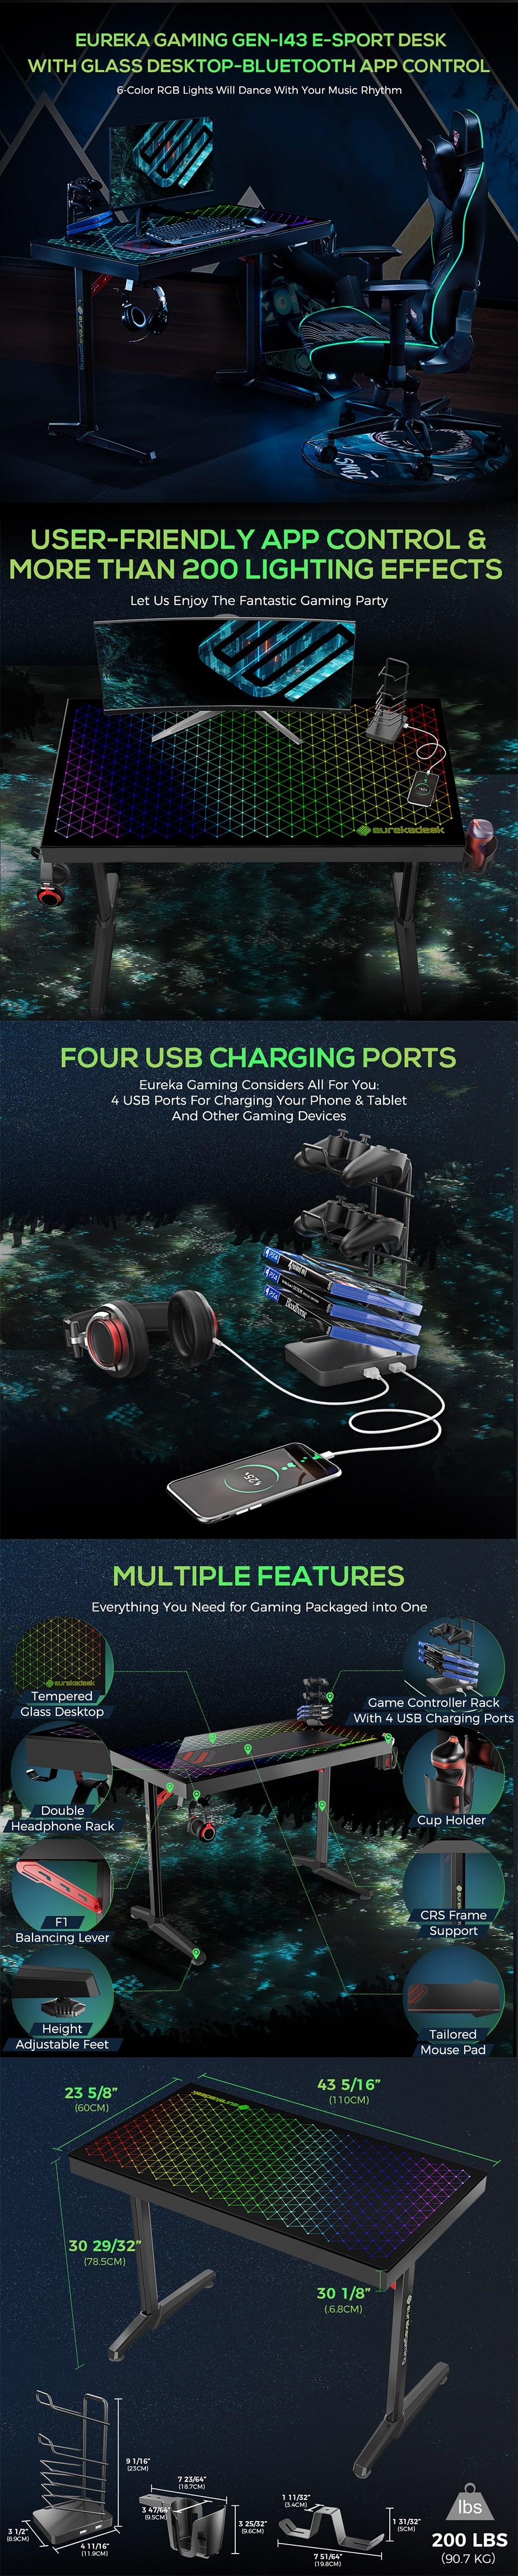 Eureka Ergonomic GTG-I43 RGB Glass Gaming Desk - Overview 1